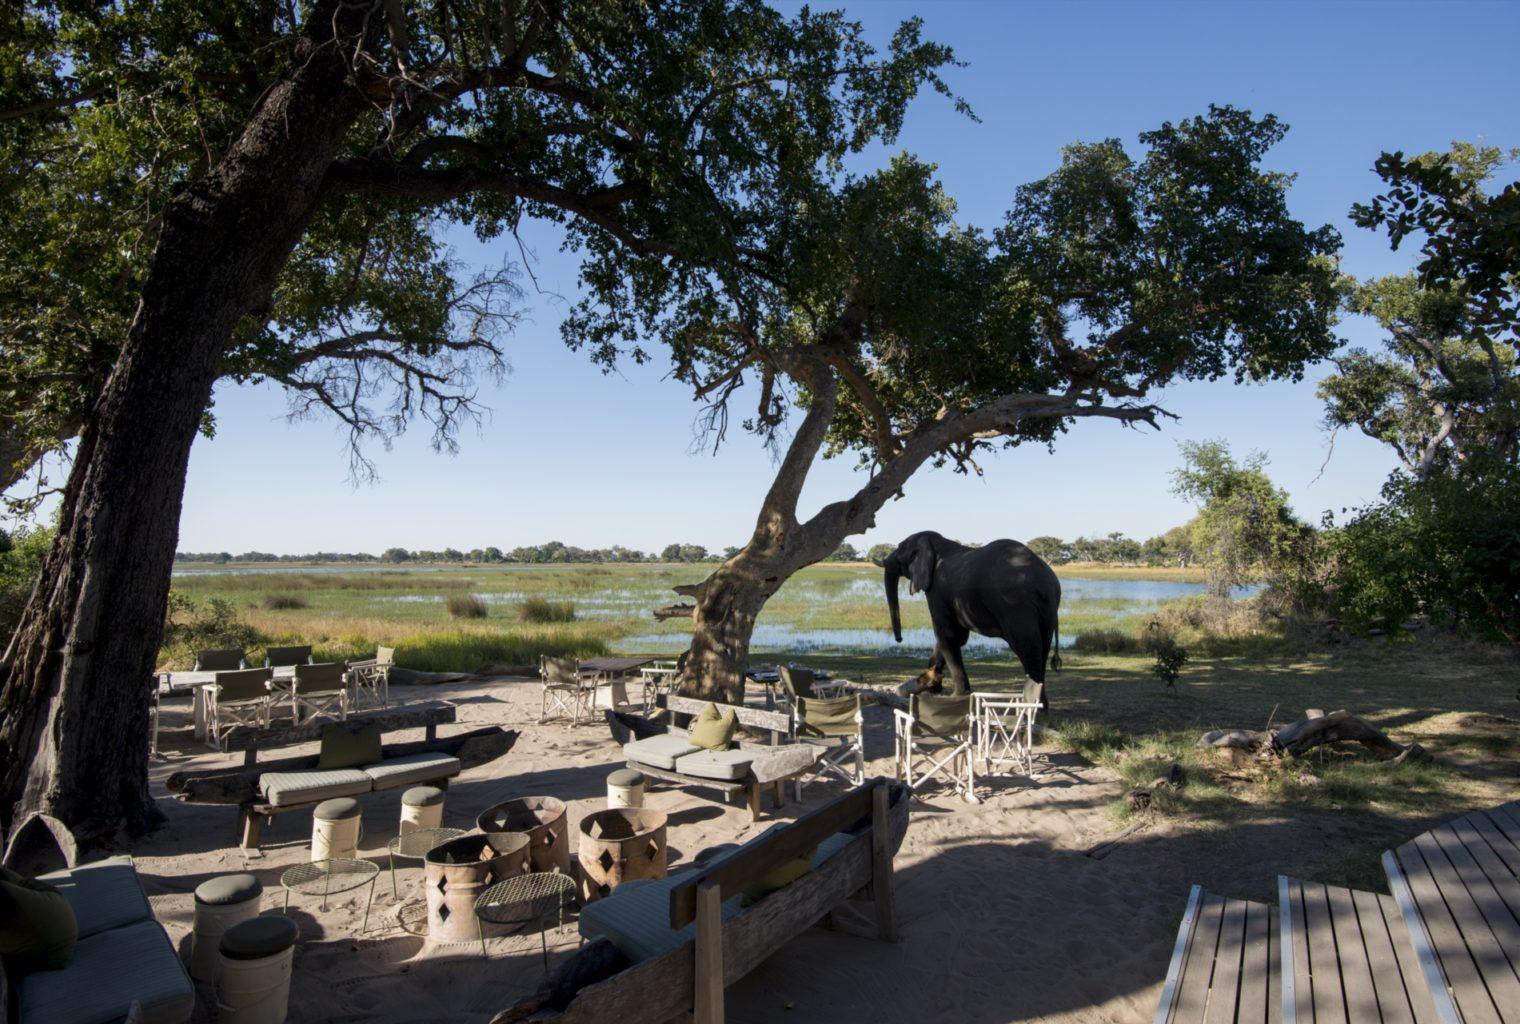 &Beyond, Xaranna, Okavango Delta, Camp, Guest Area Elephant